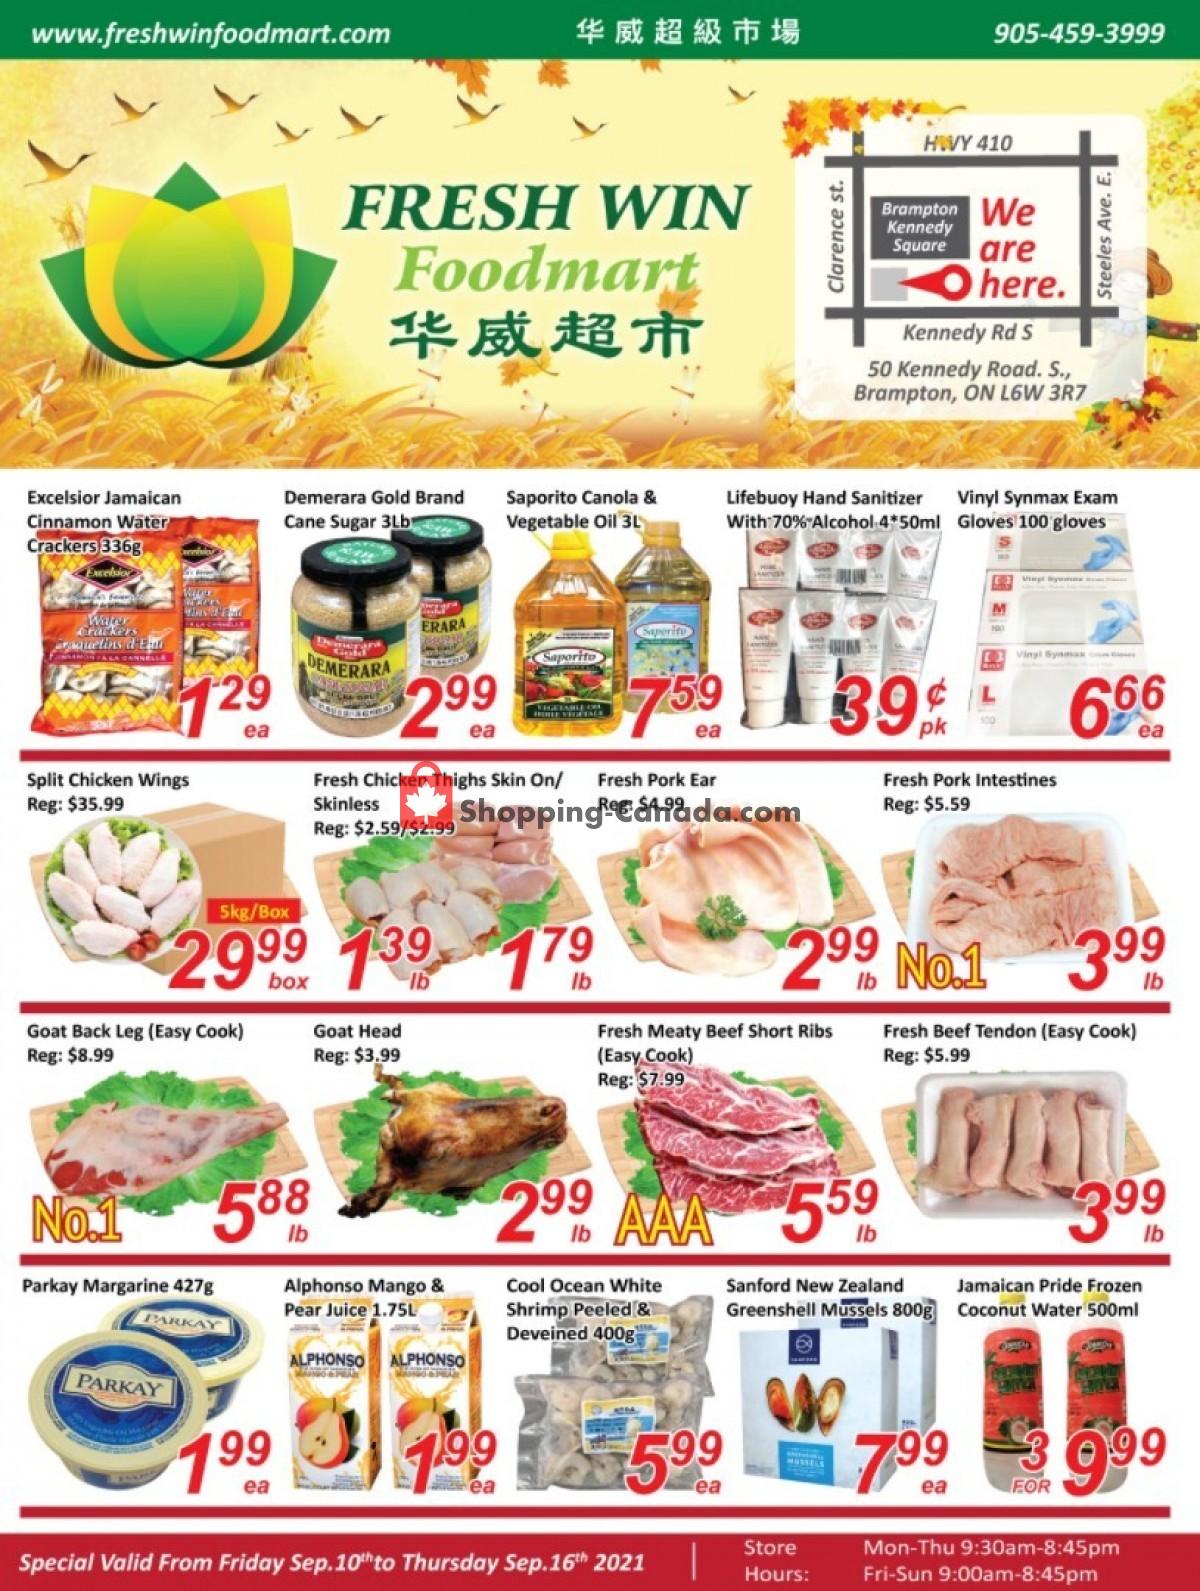 Flyer Seasons Food Mart Canada - from Friday September 10, 2021 to Thursday September 16, 2021